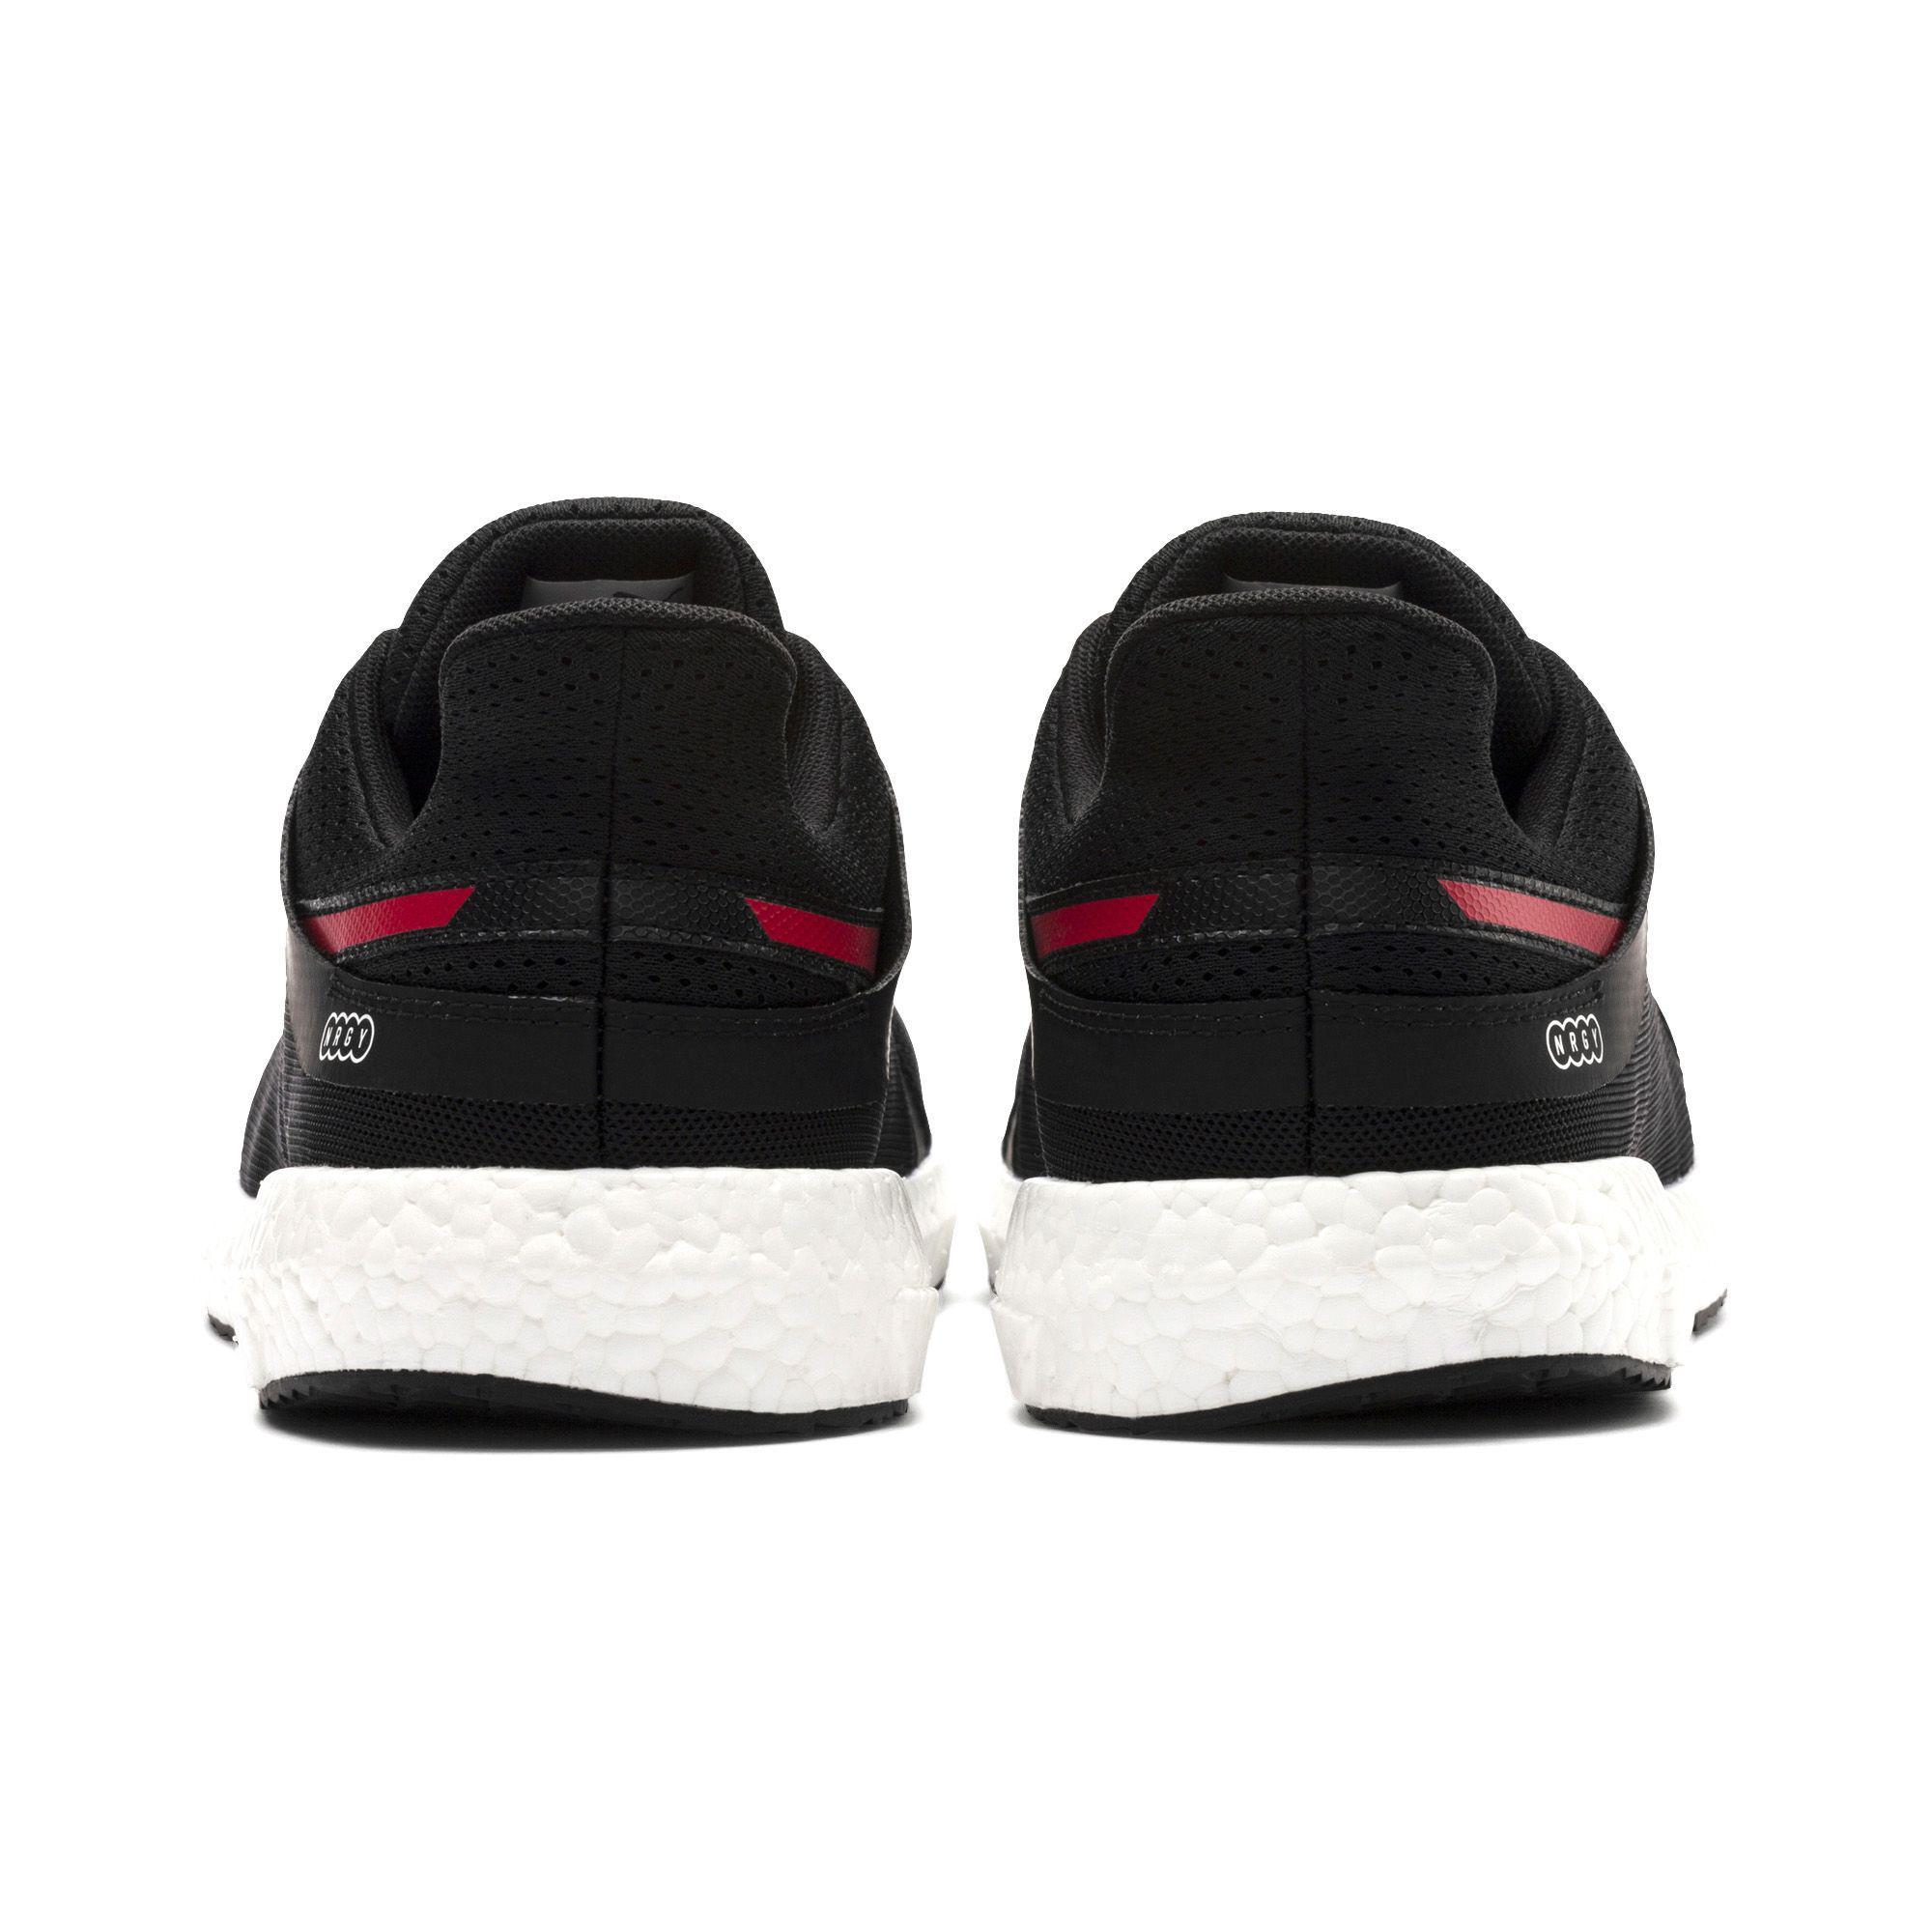 deee16a65f816c PUMA - Black Mega Nrgy Turbo 2 Men s Running Shoes for Men - Lyst. View  fullscreen